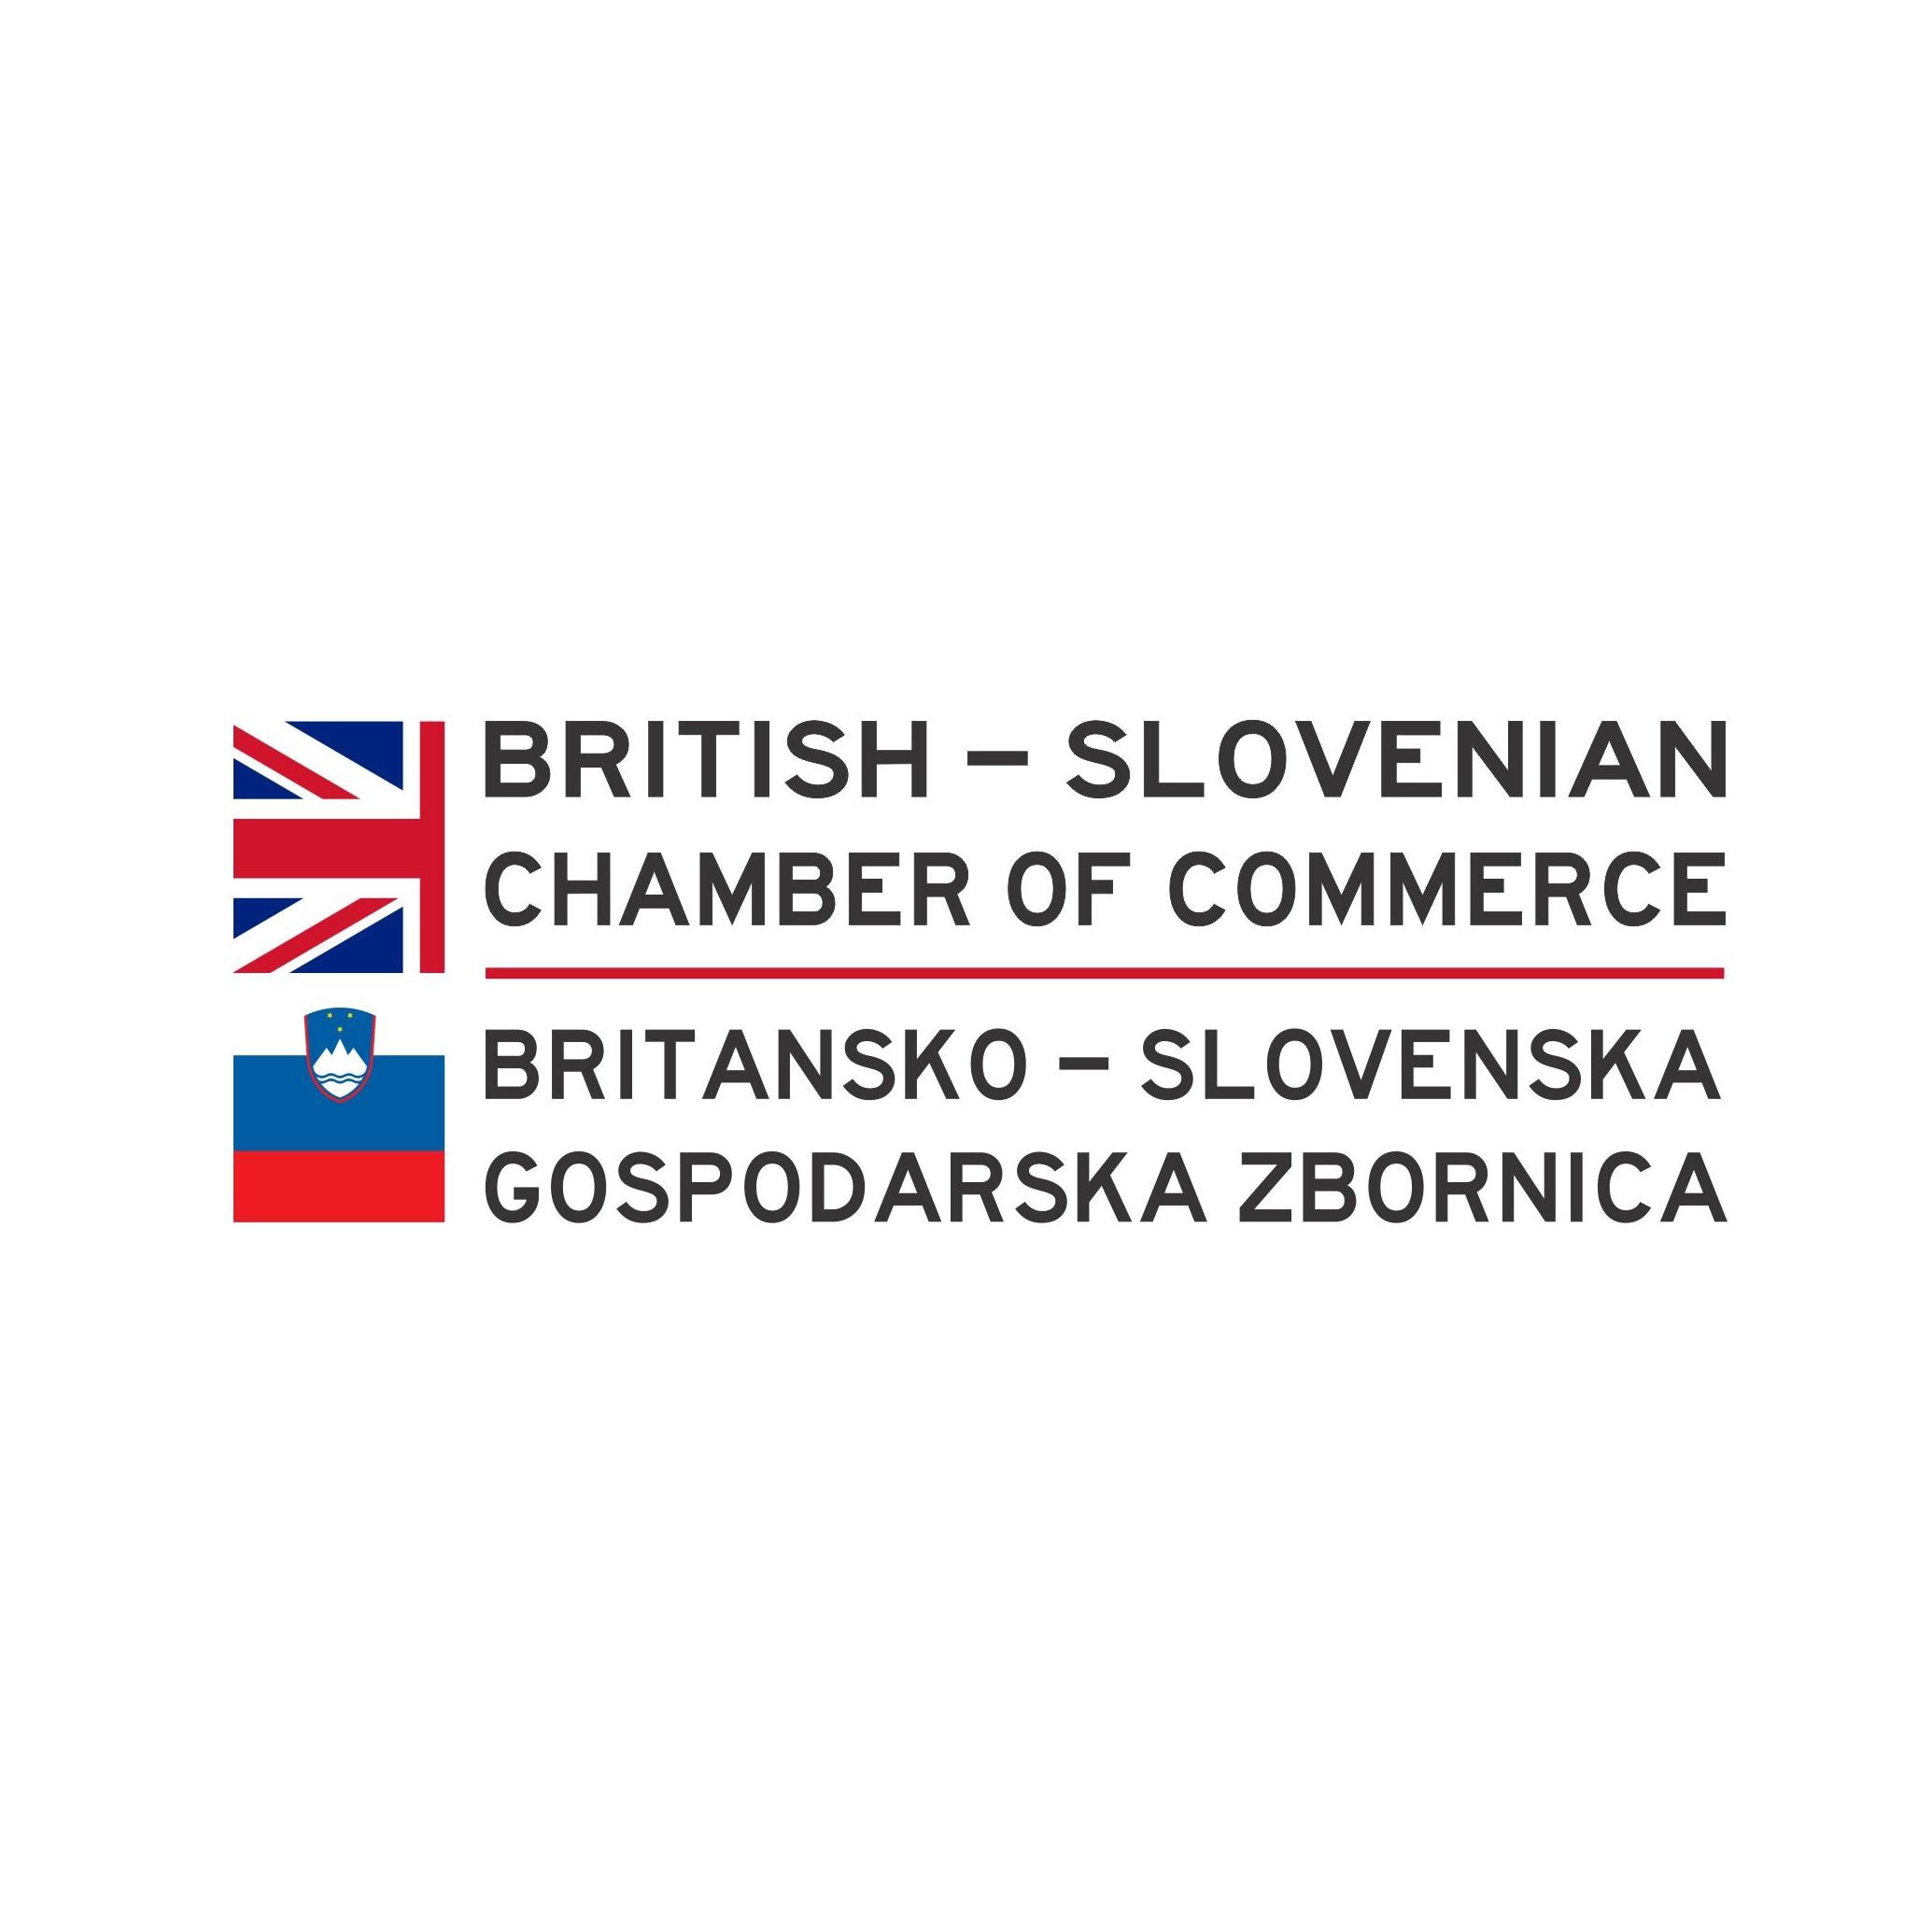 British Slovenian Chamber of Commerce